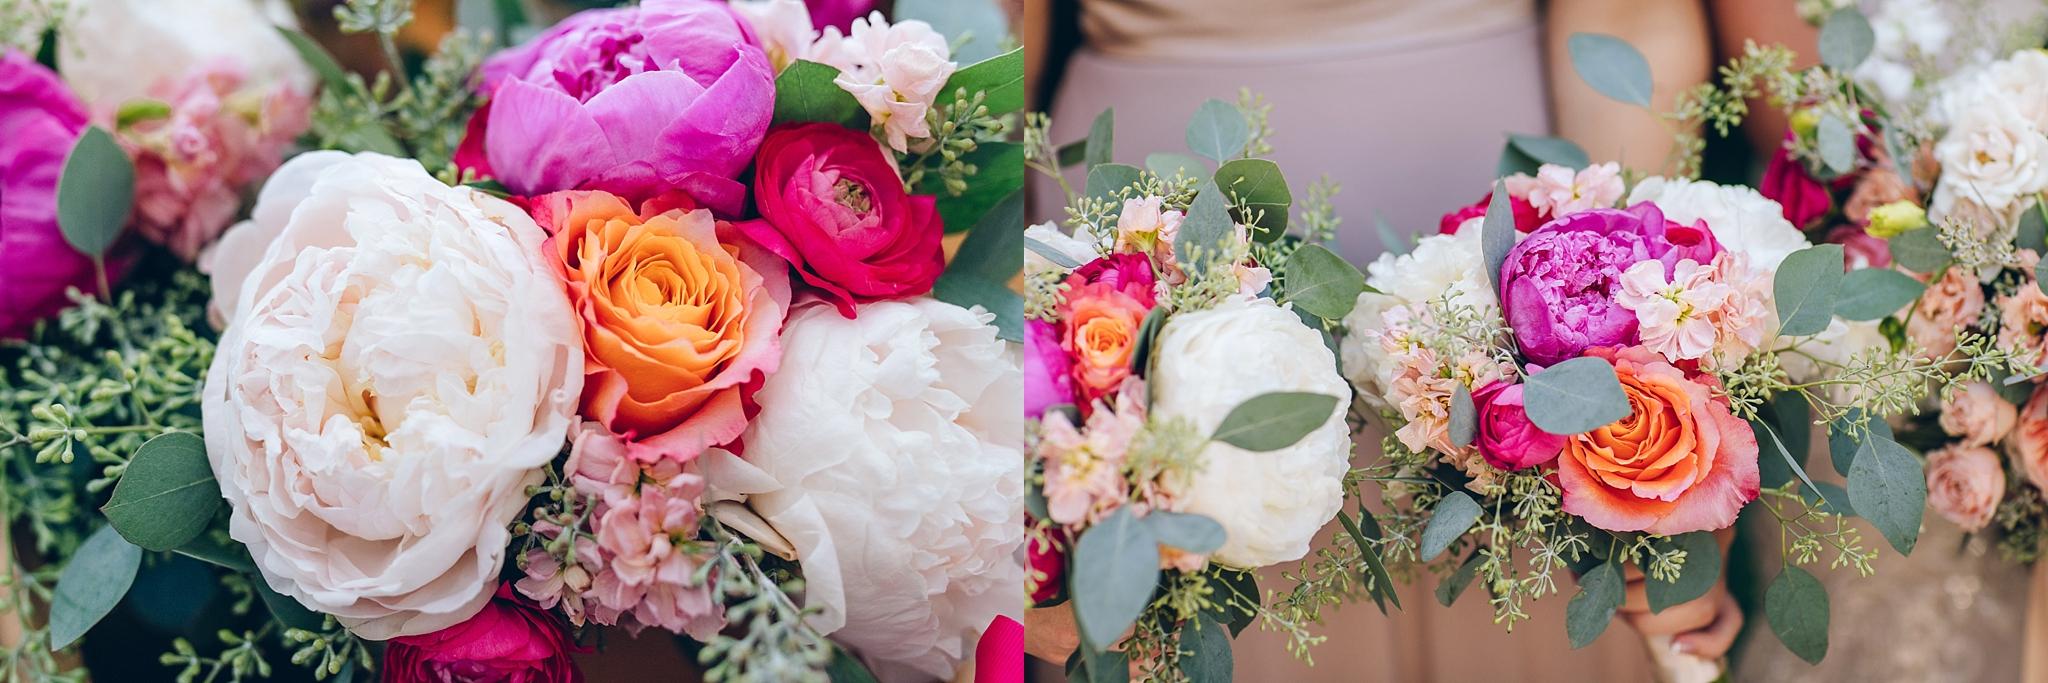 baker-lofts-holland-michigan-wedding-photographer_0309.jpg